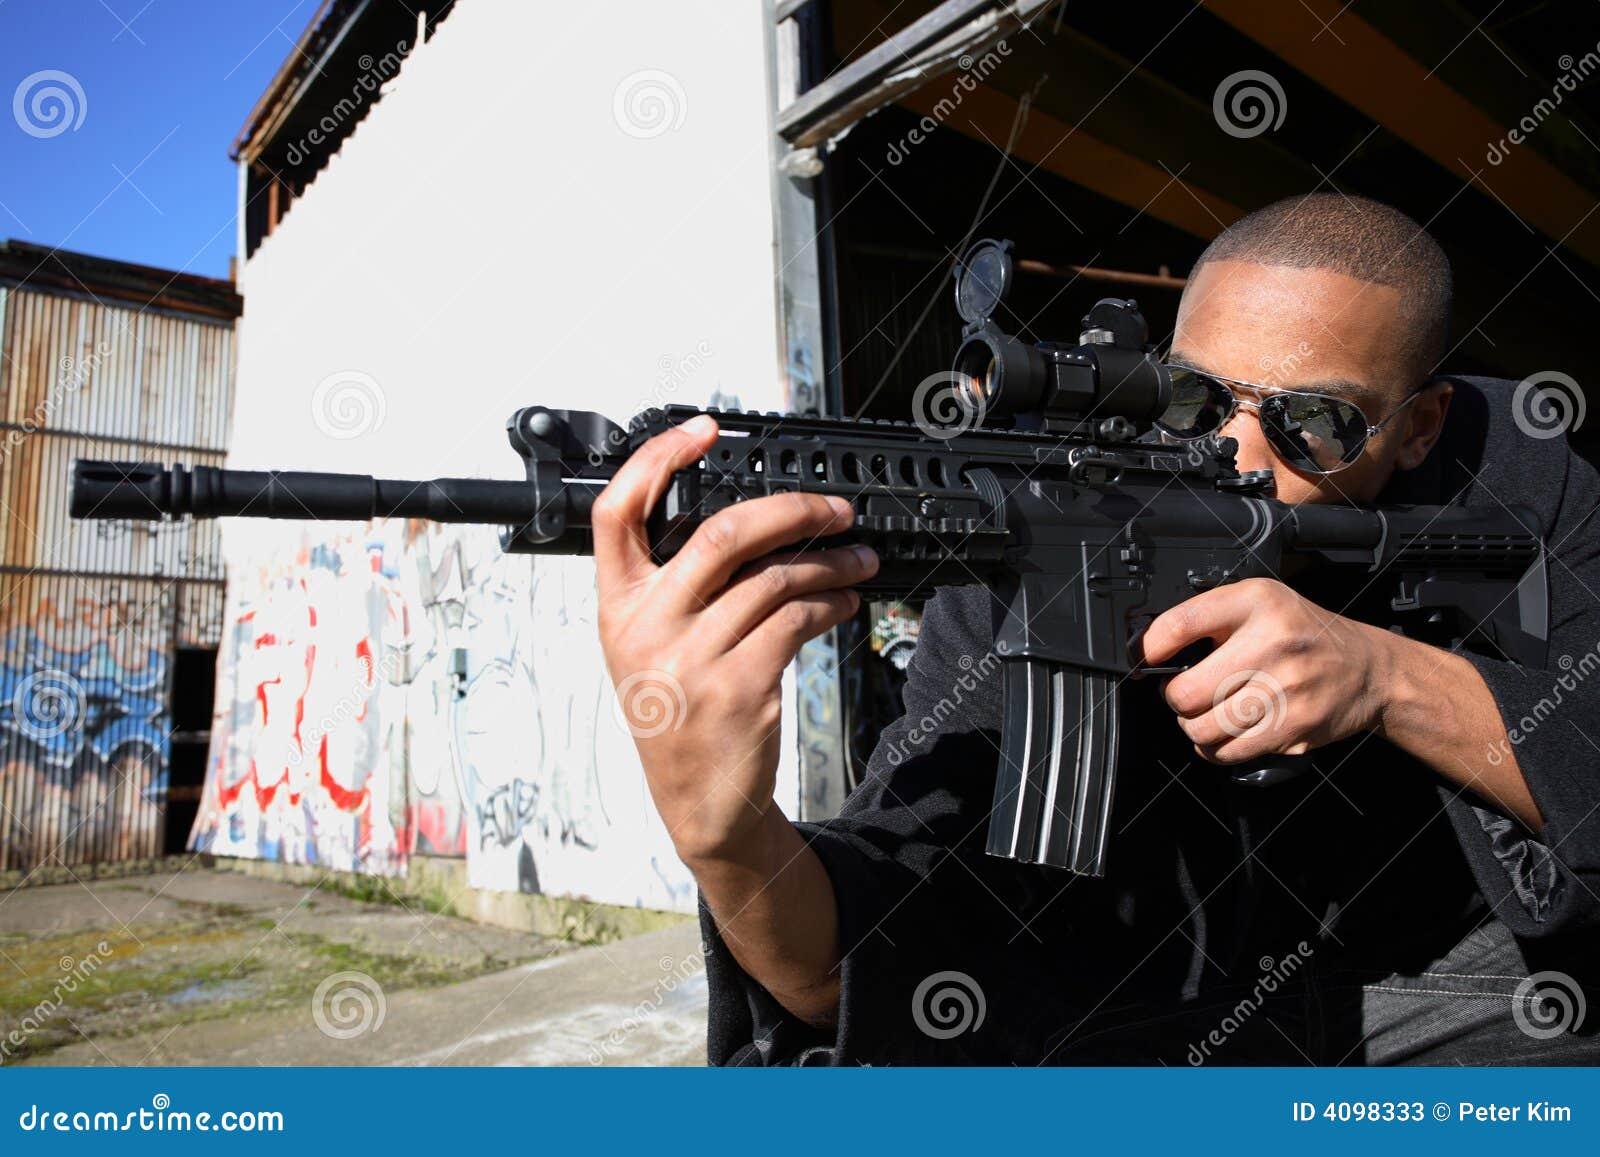 Man Aiming Rifle Stock Photos - Image: 4098333